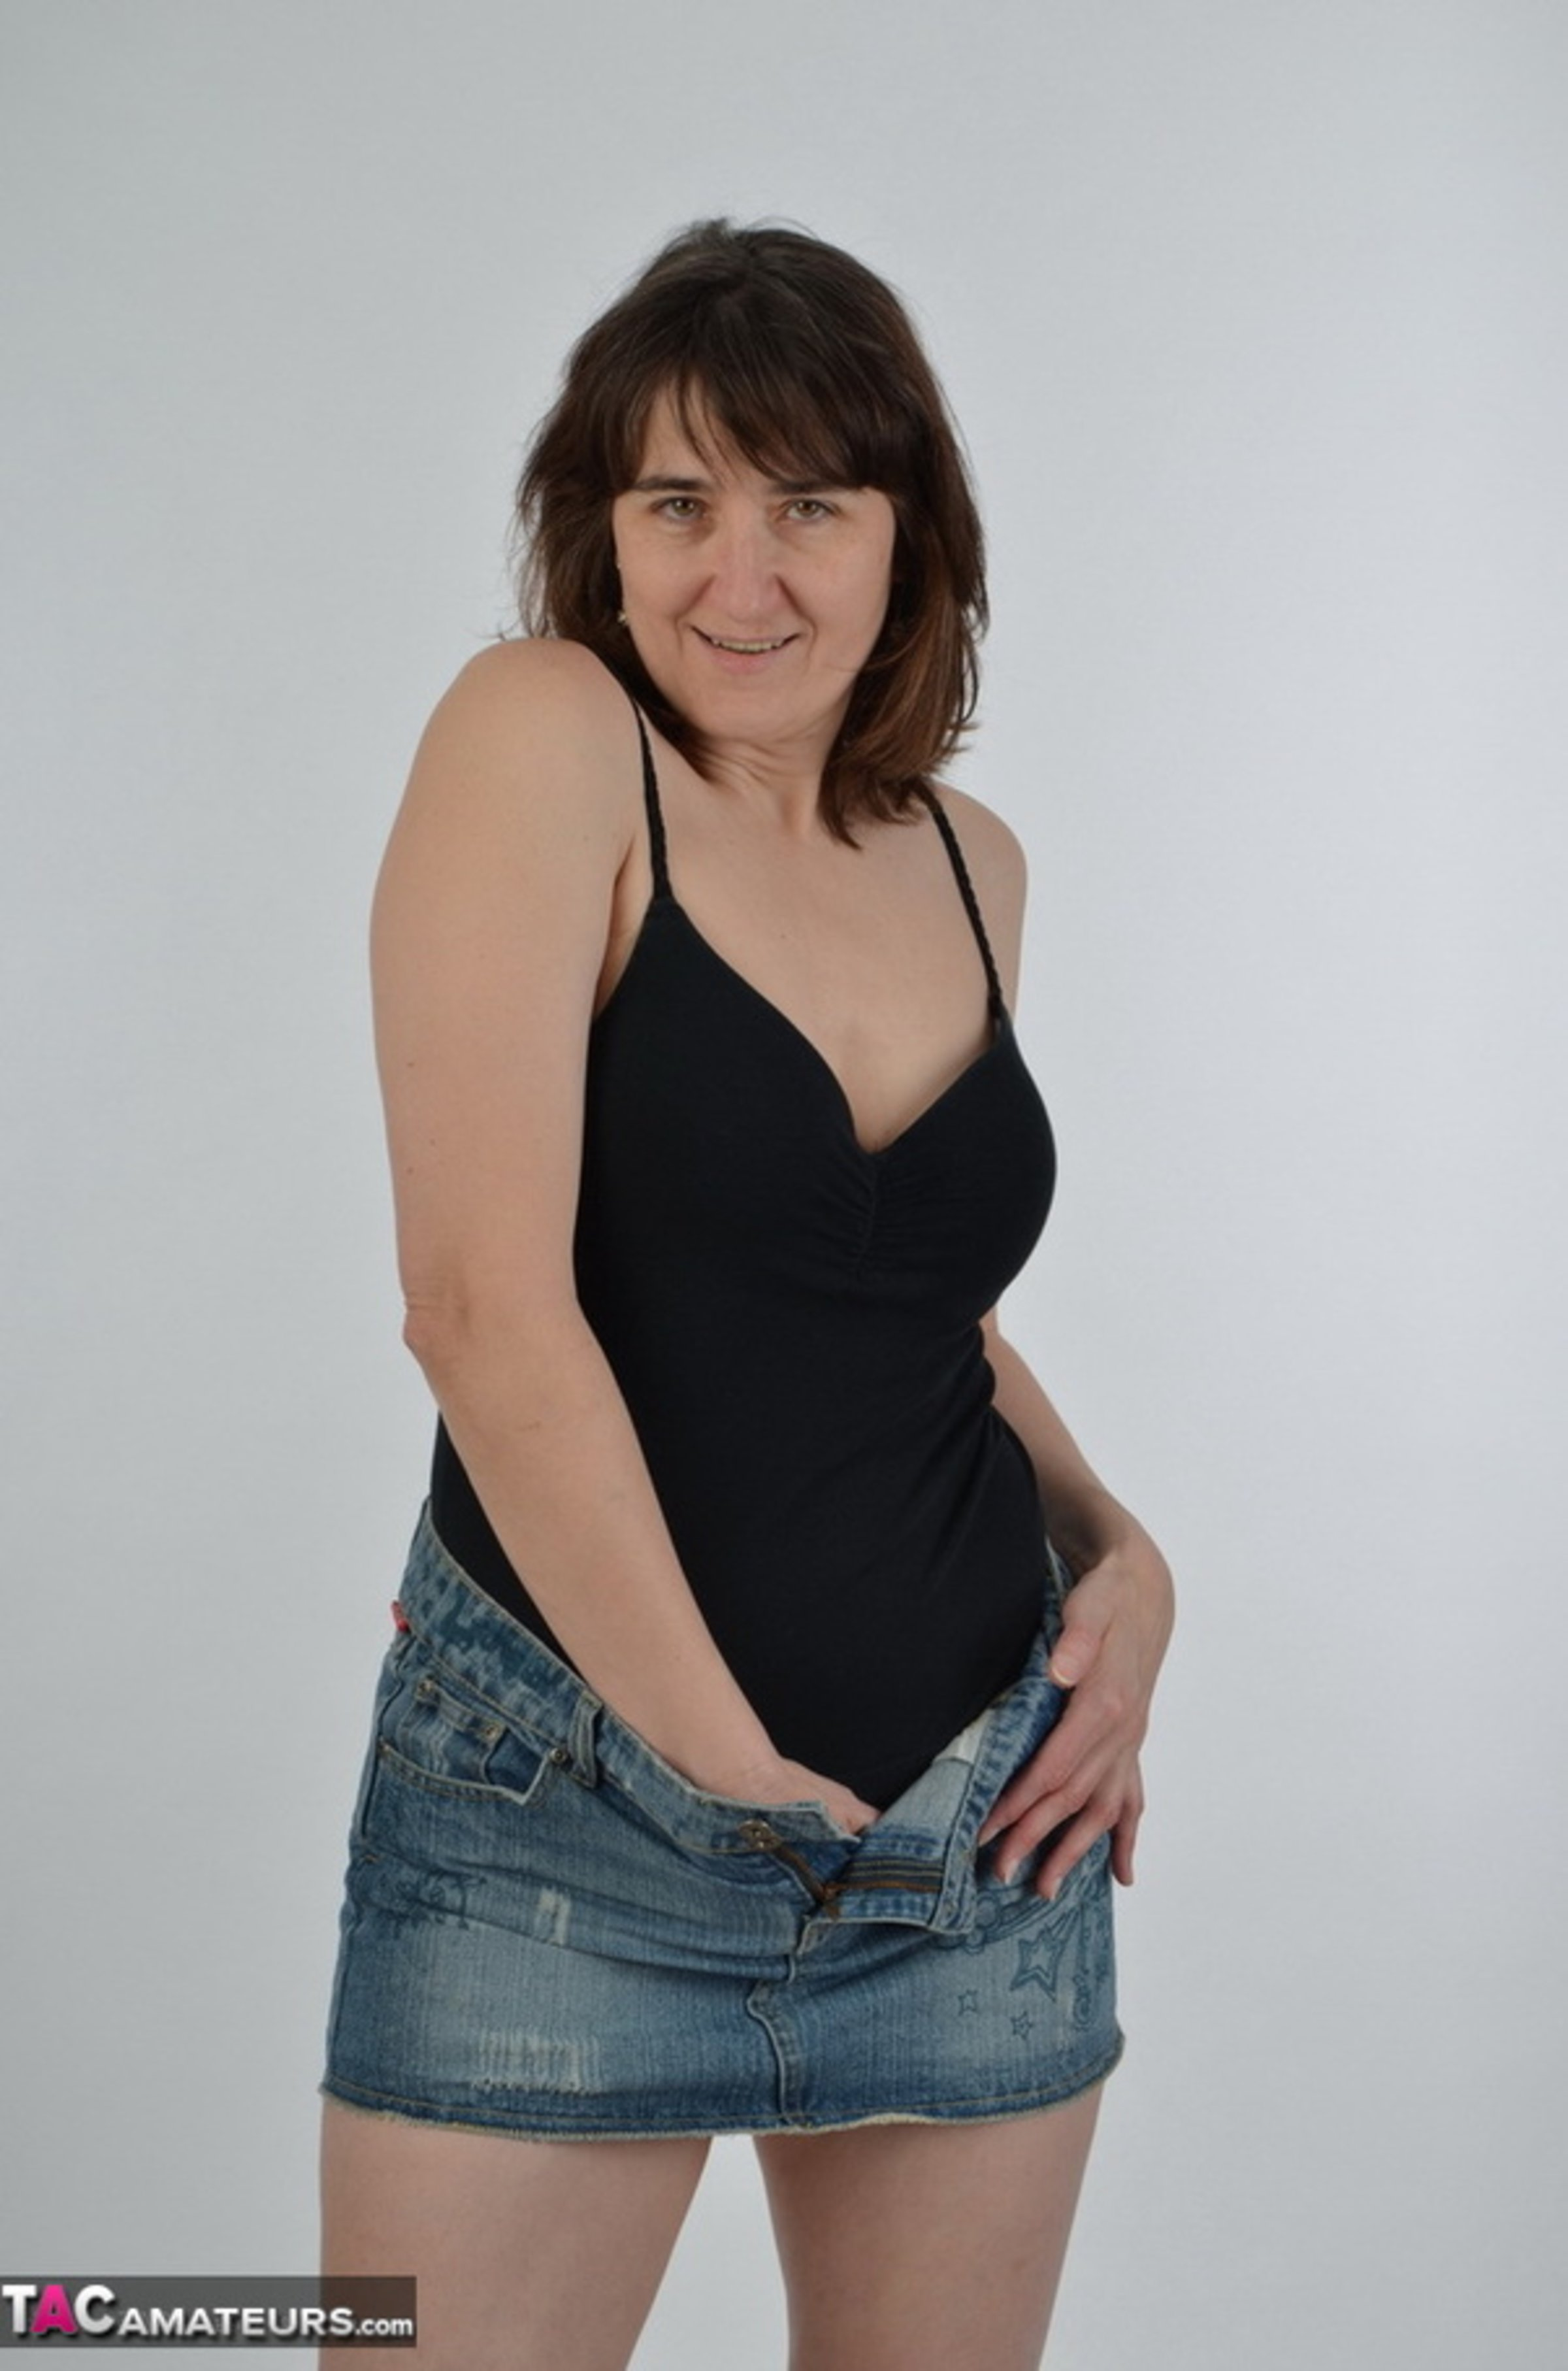 Brunette Milf In Black And Denim Skirt Gets Naked To Show